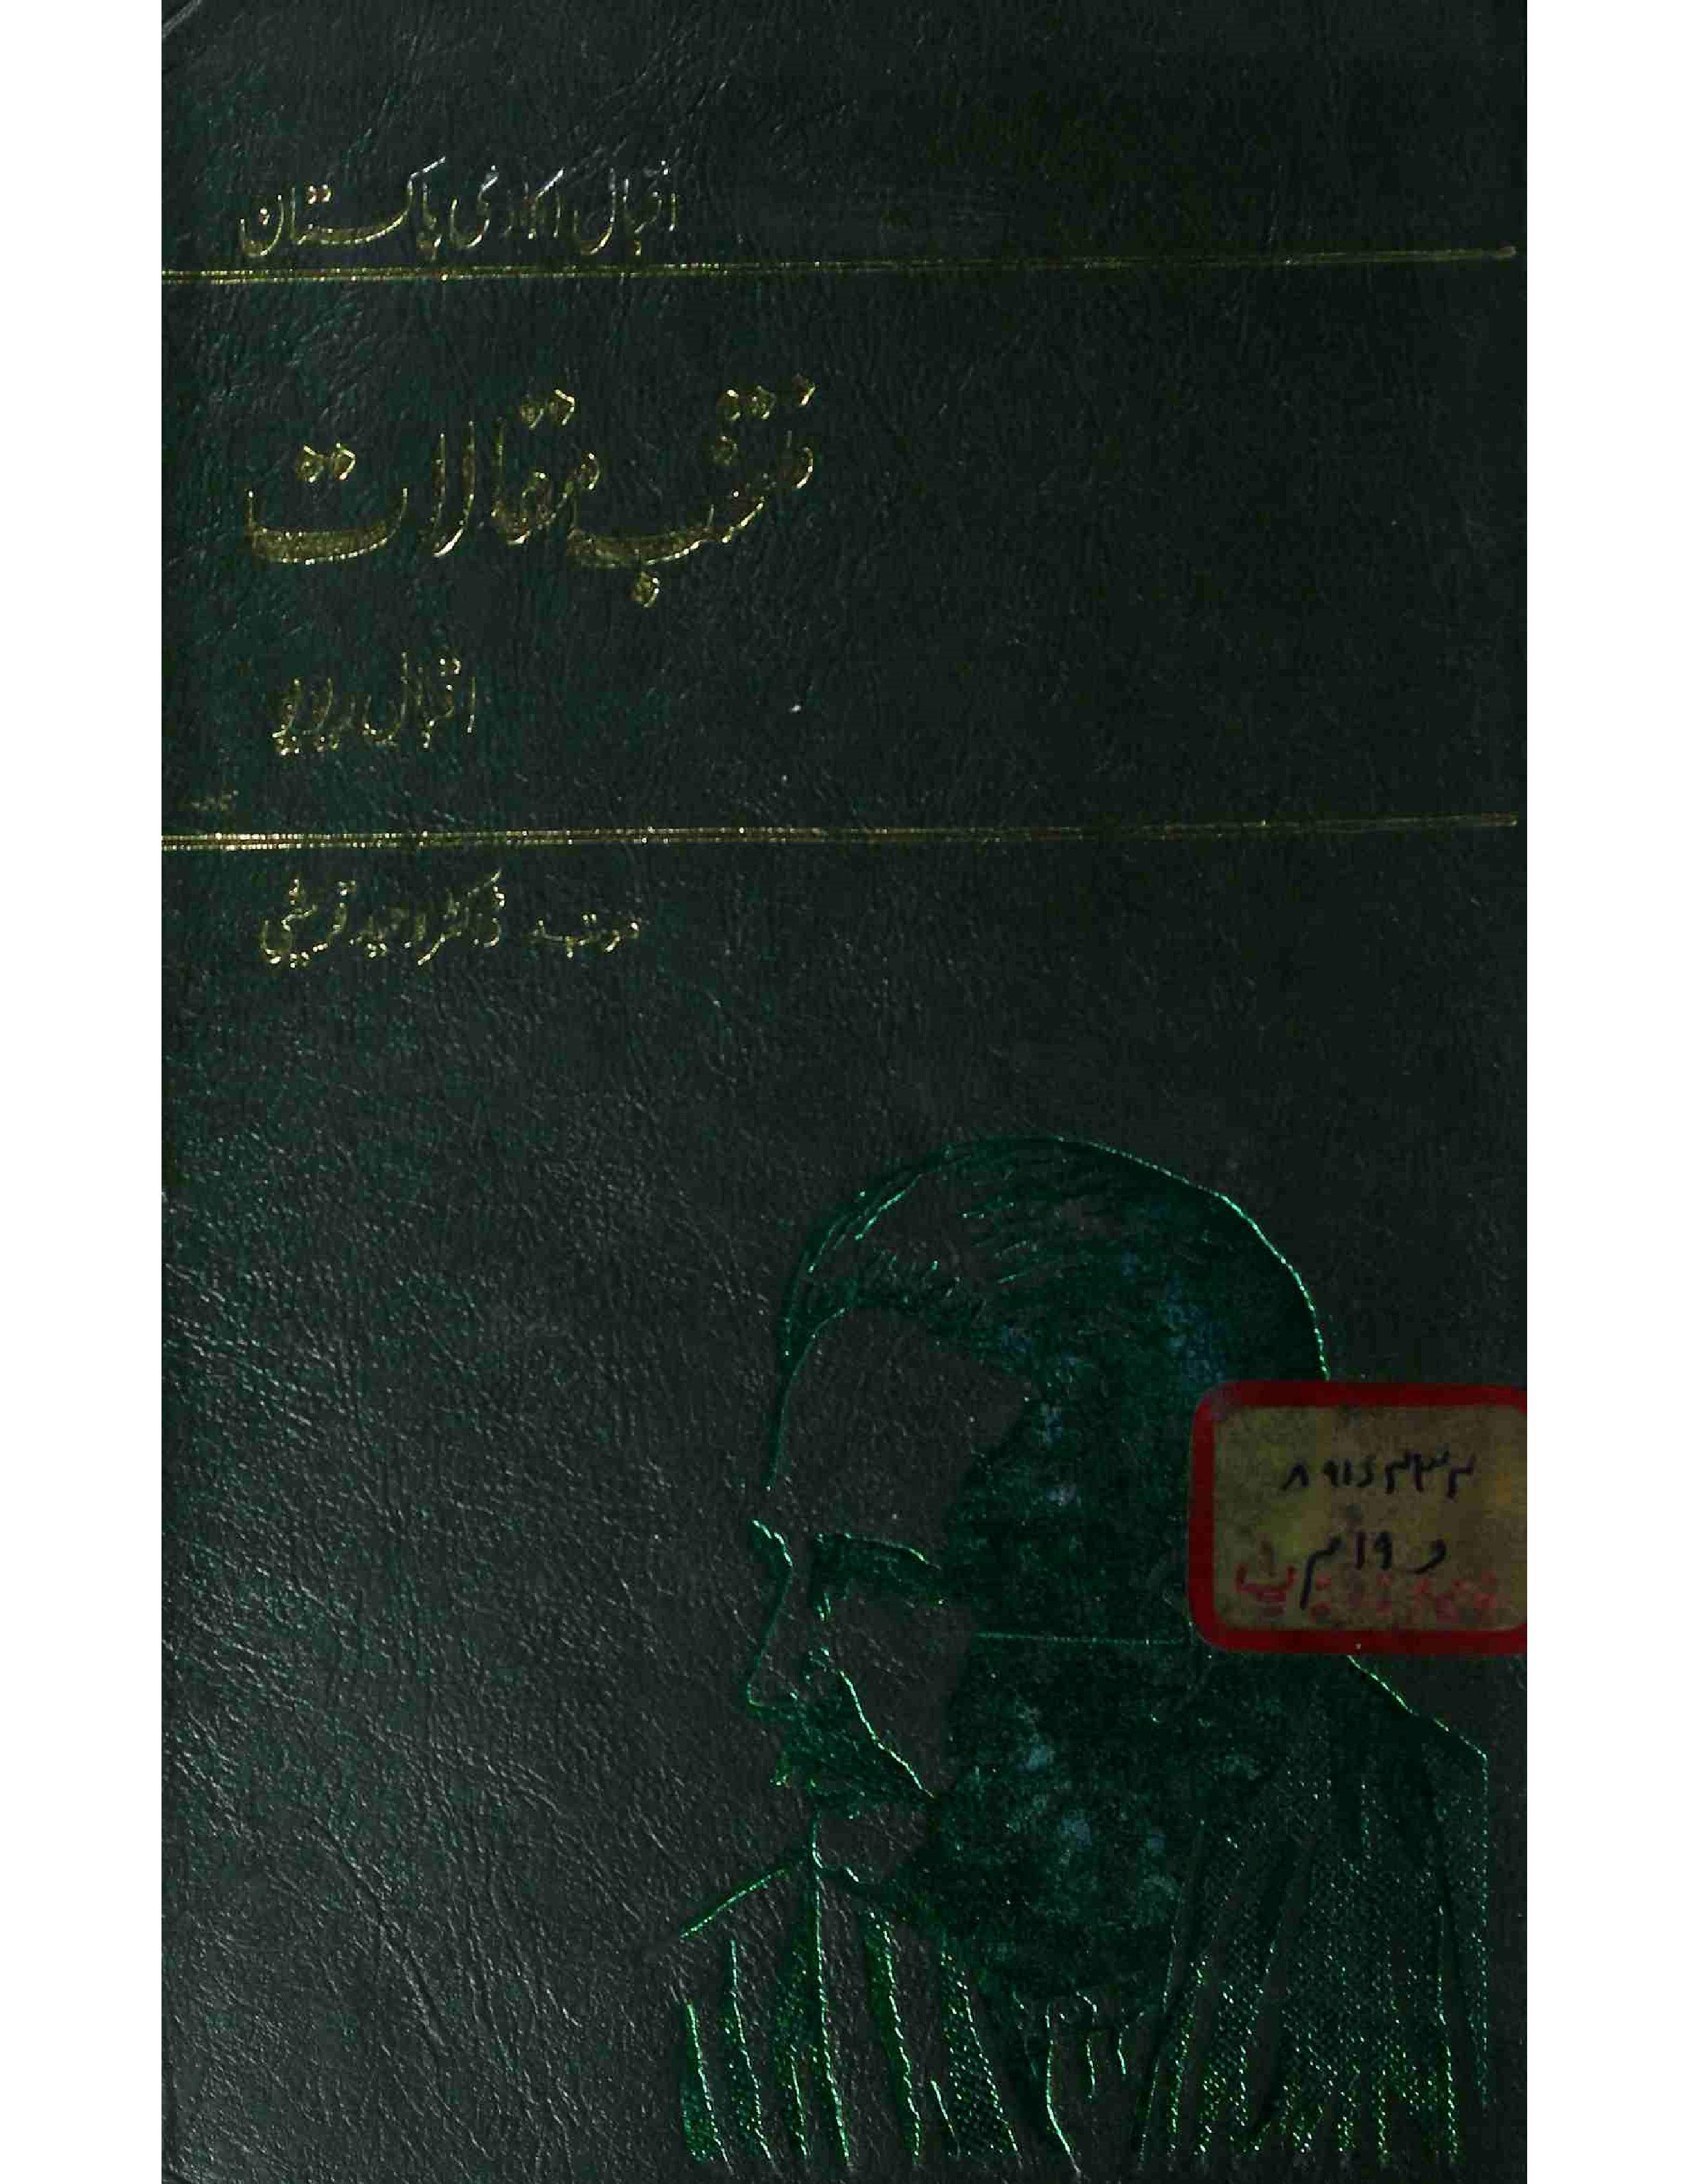 Muntakhab Maqalat     Iqbal Review